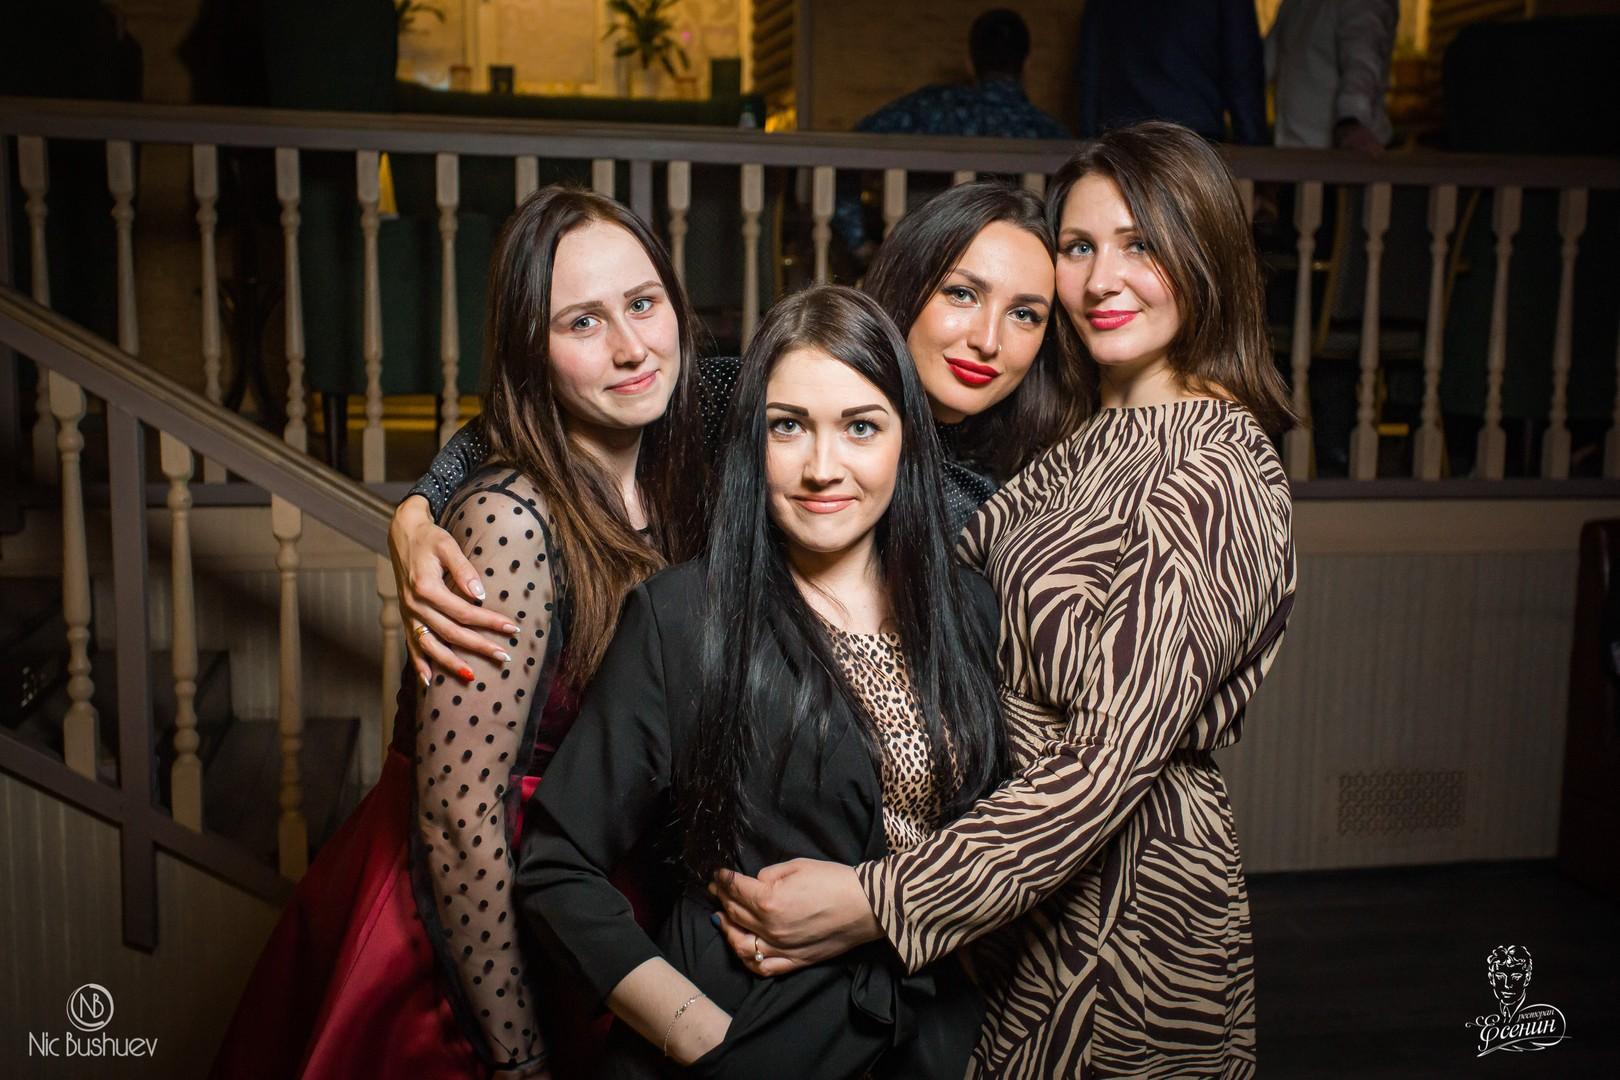 Ресторан Орехово-Зуево Есенин 29_02_2020 (14)